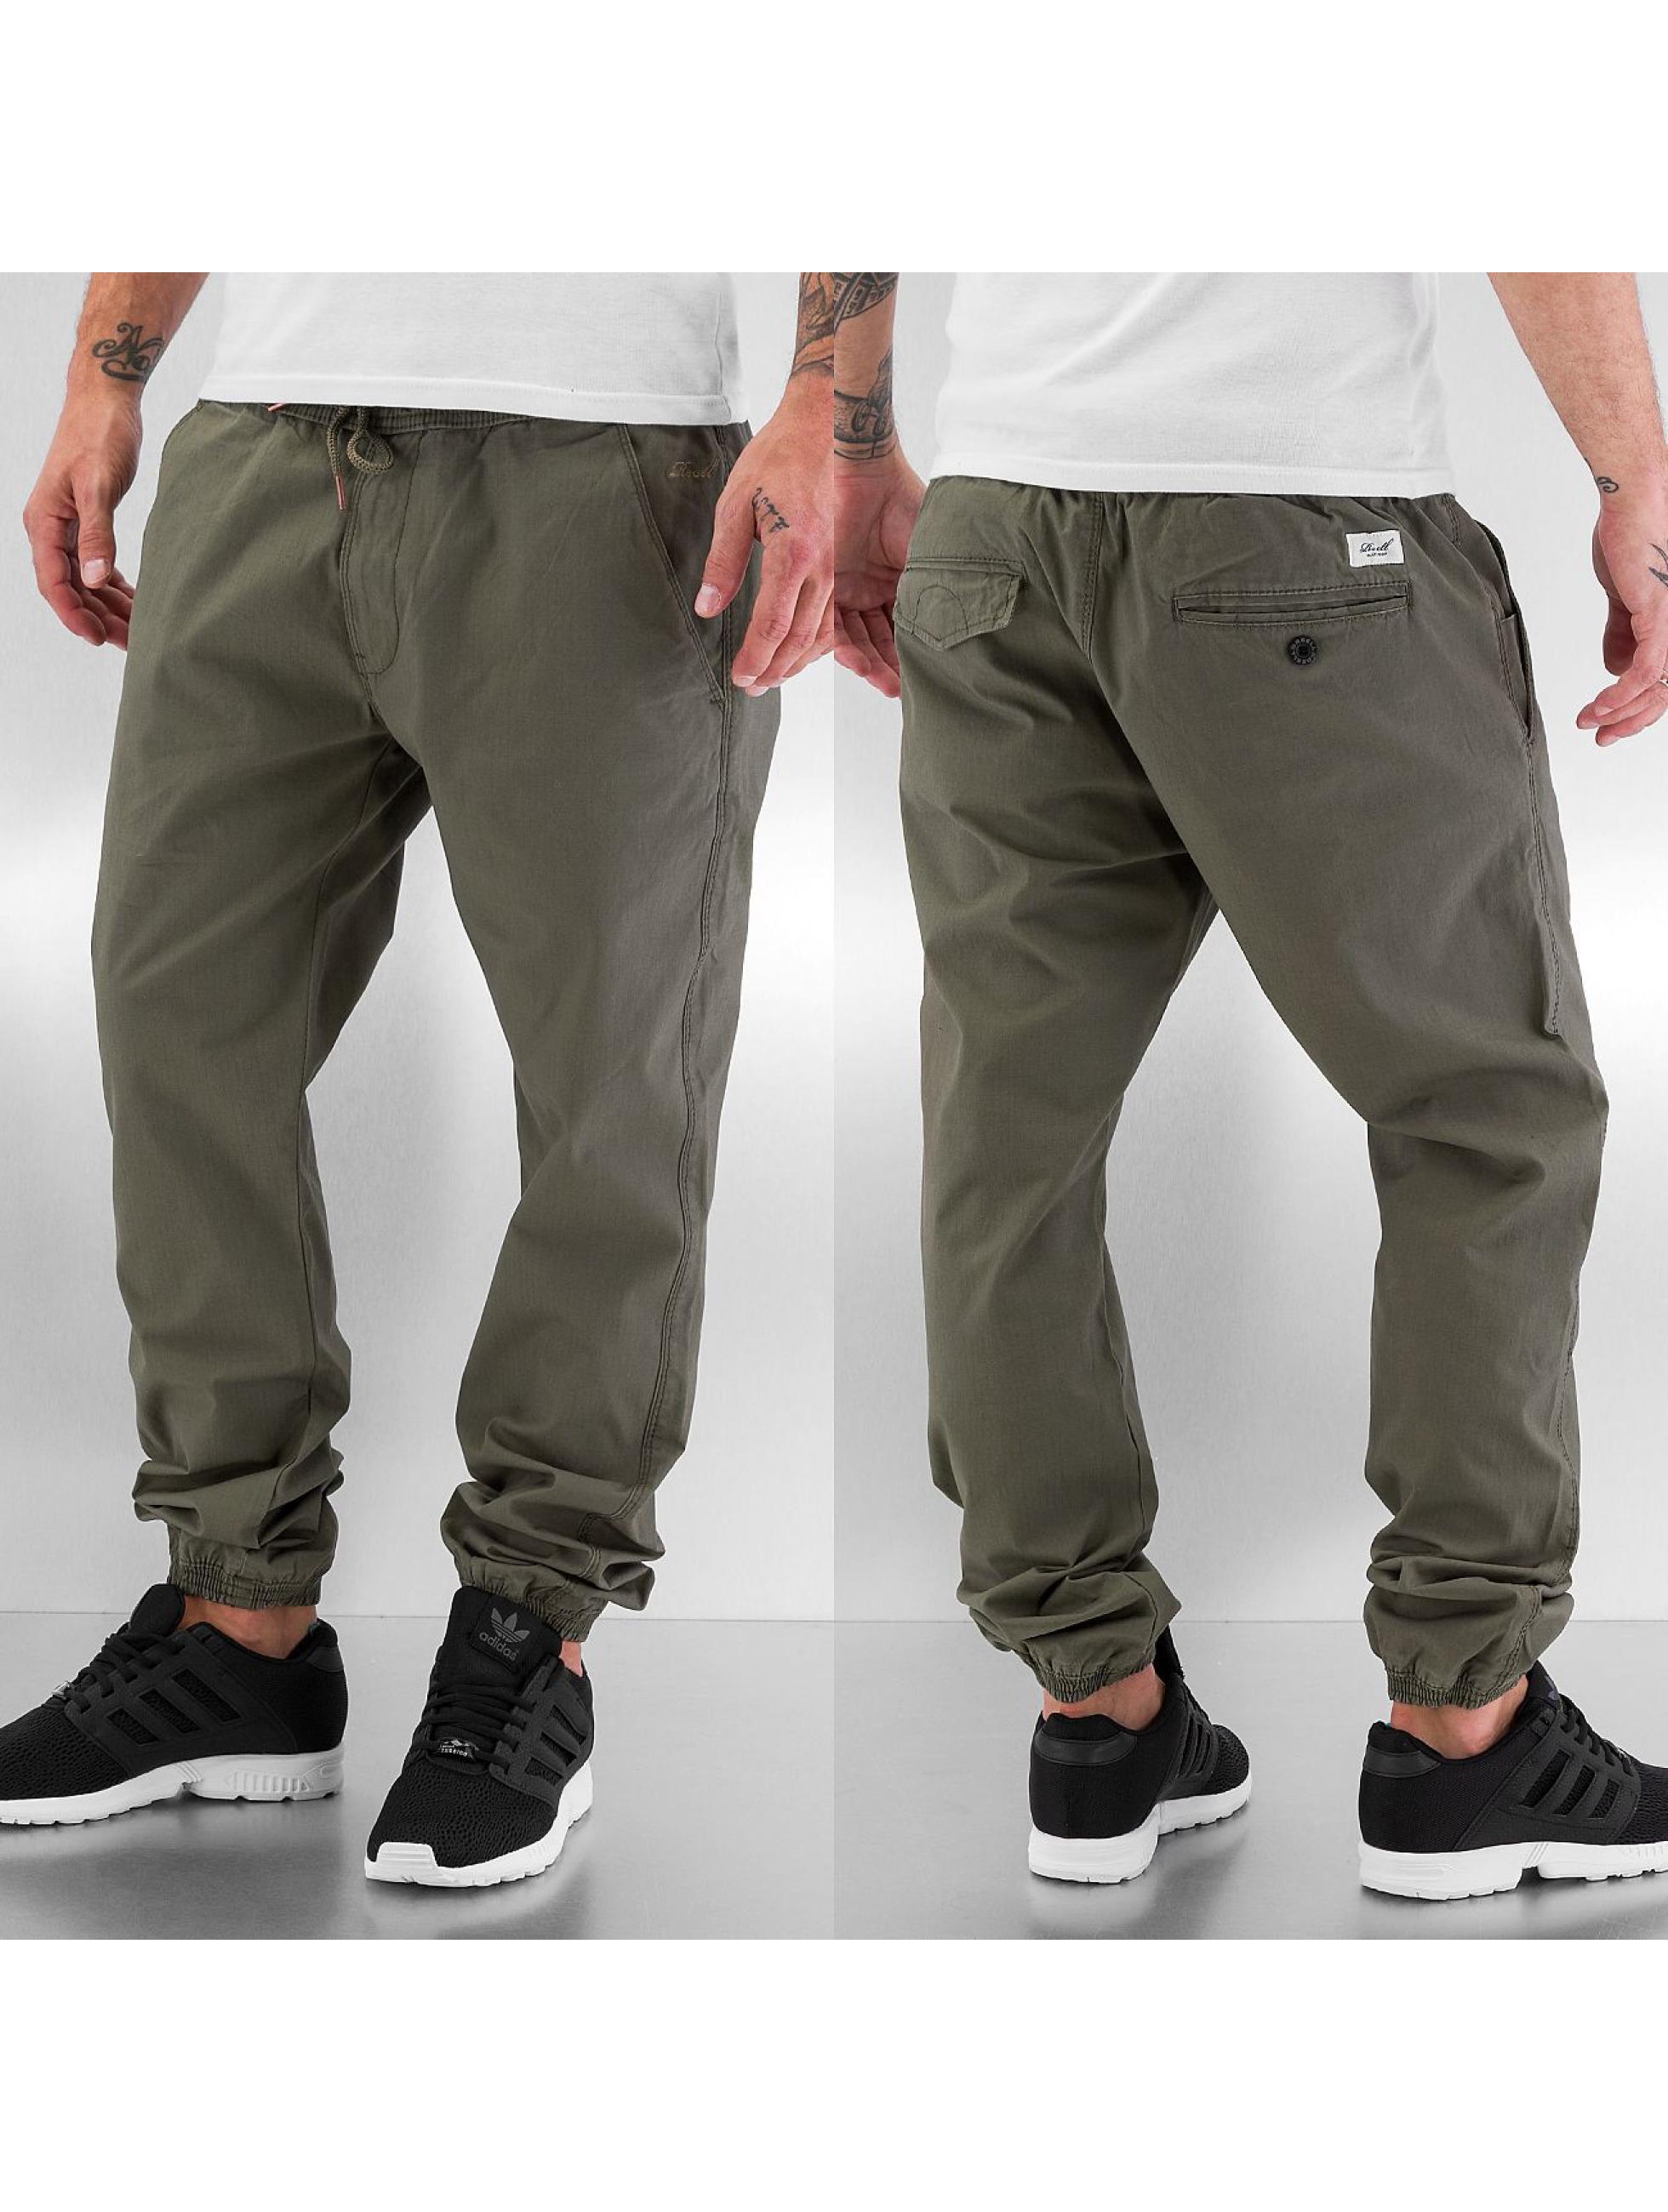 Reell Jeans Спортивные брюки Reflex зеленый